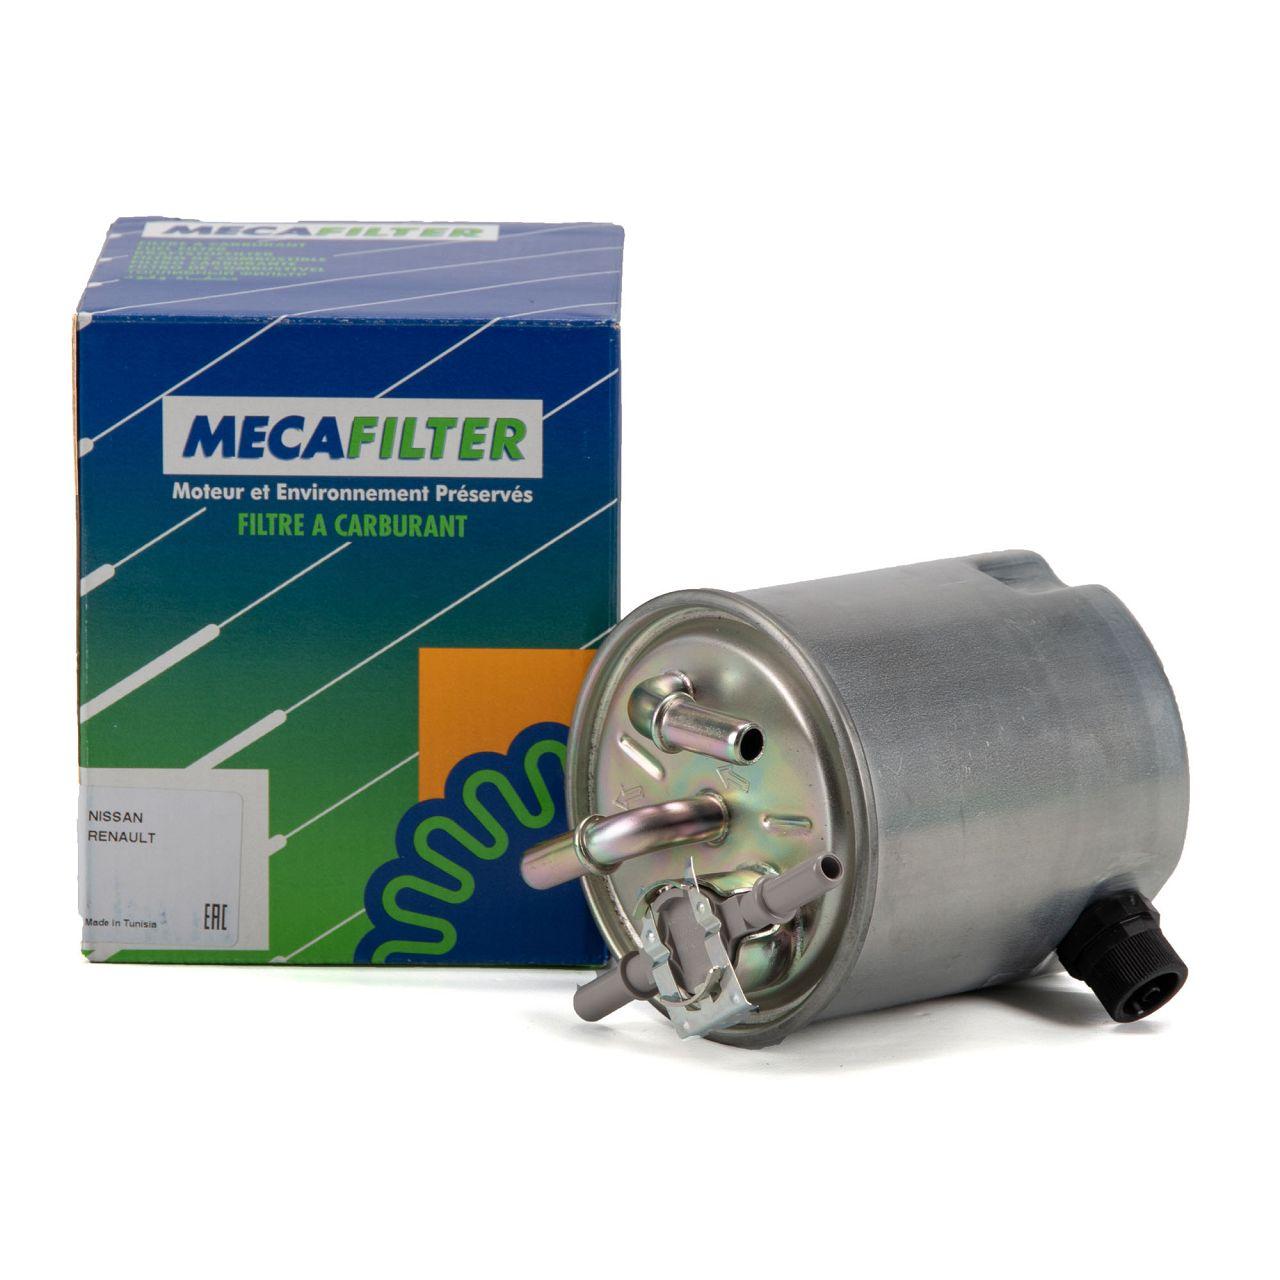 MECAFILTER Kraftstofffilter Dieselfilter NISSAN Qashqai I X-Trail T31 2.0dCi